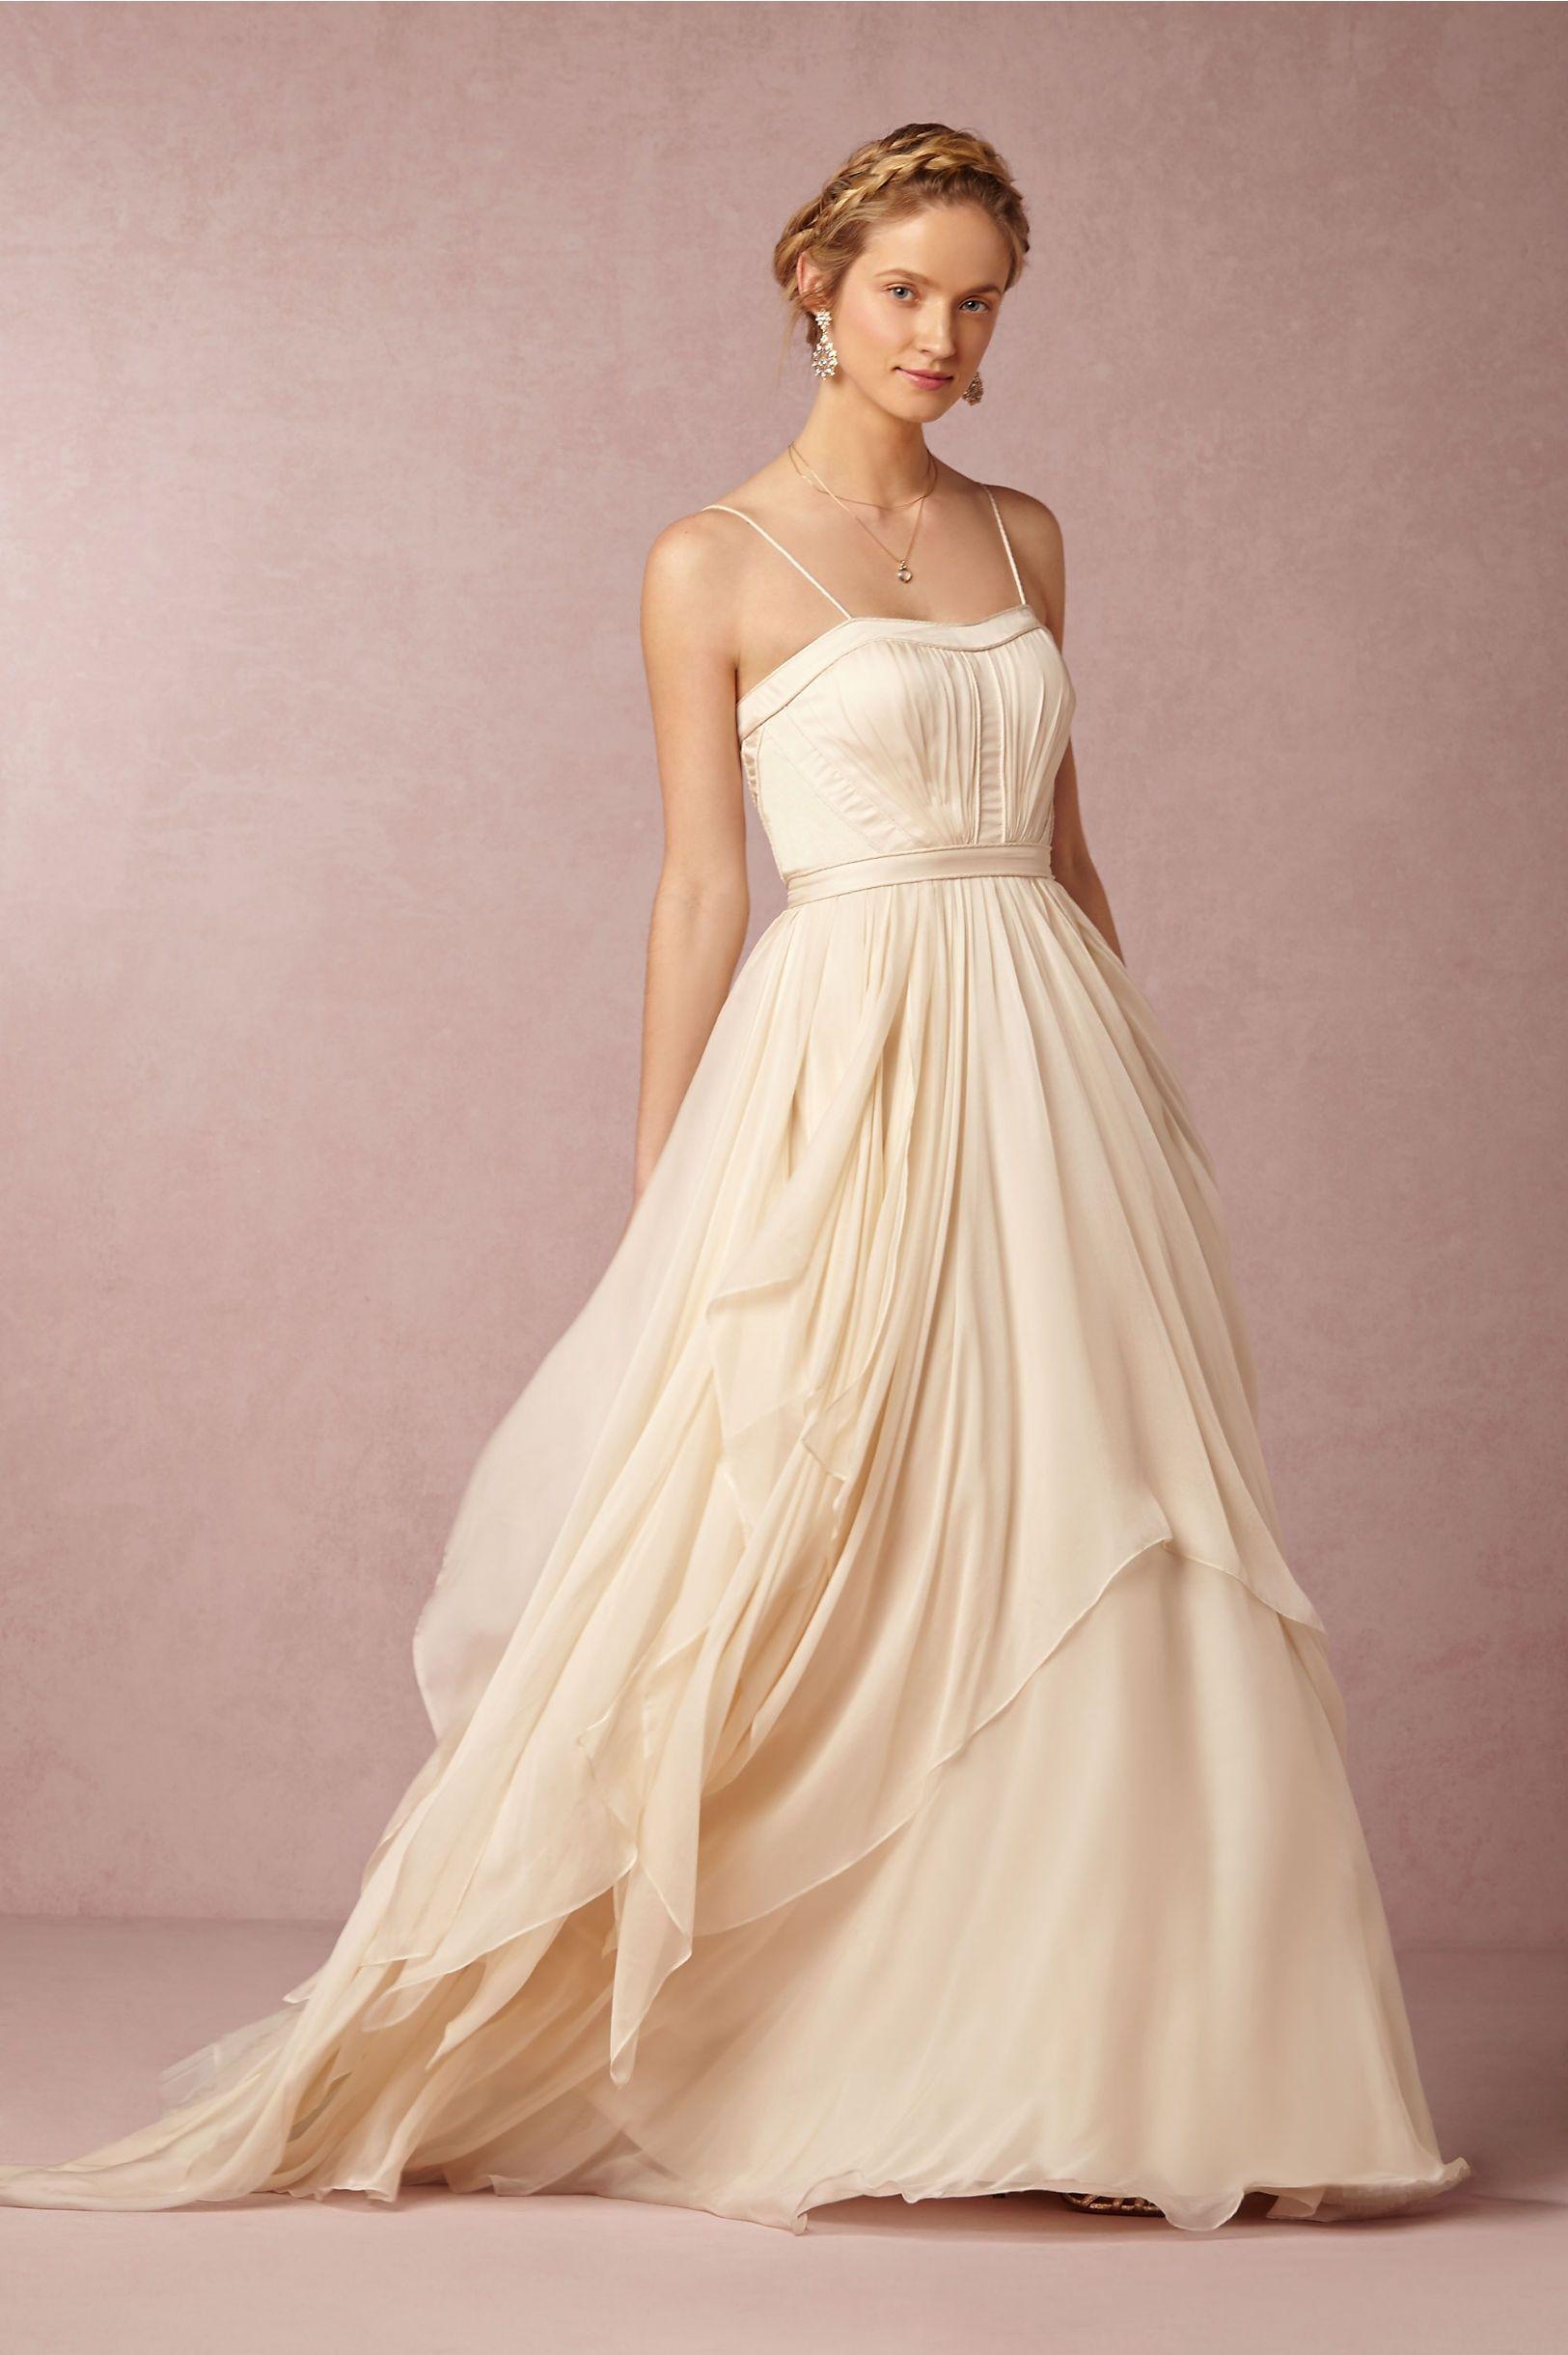 LOVE this wedding dress | Wedding Dresses | Pinterest